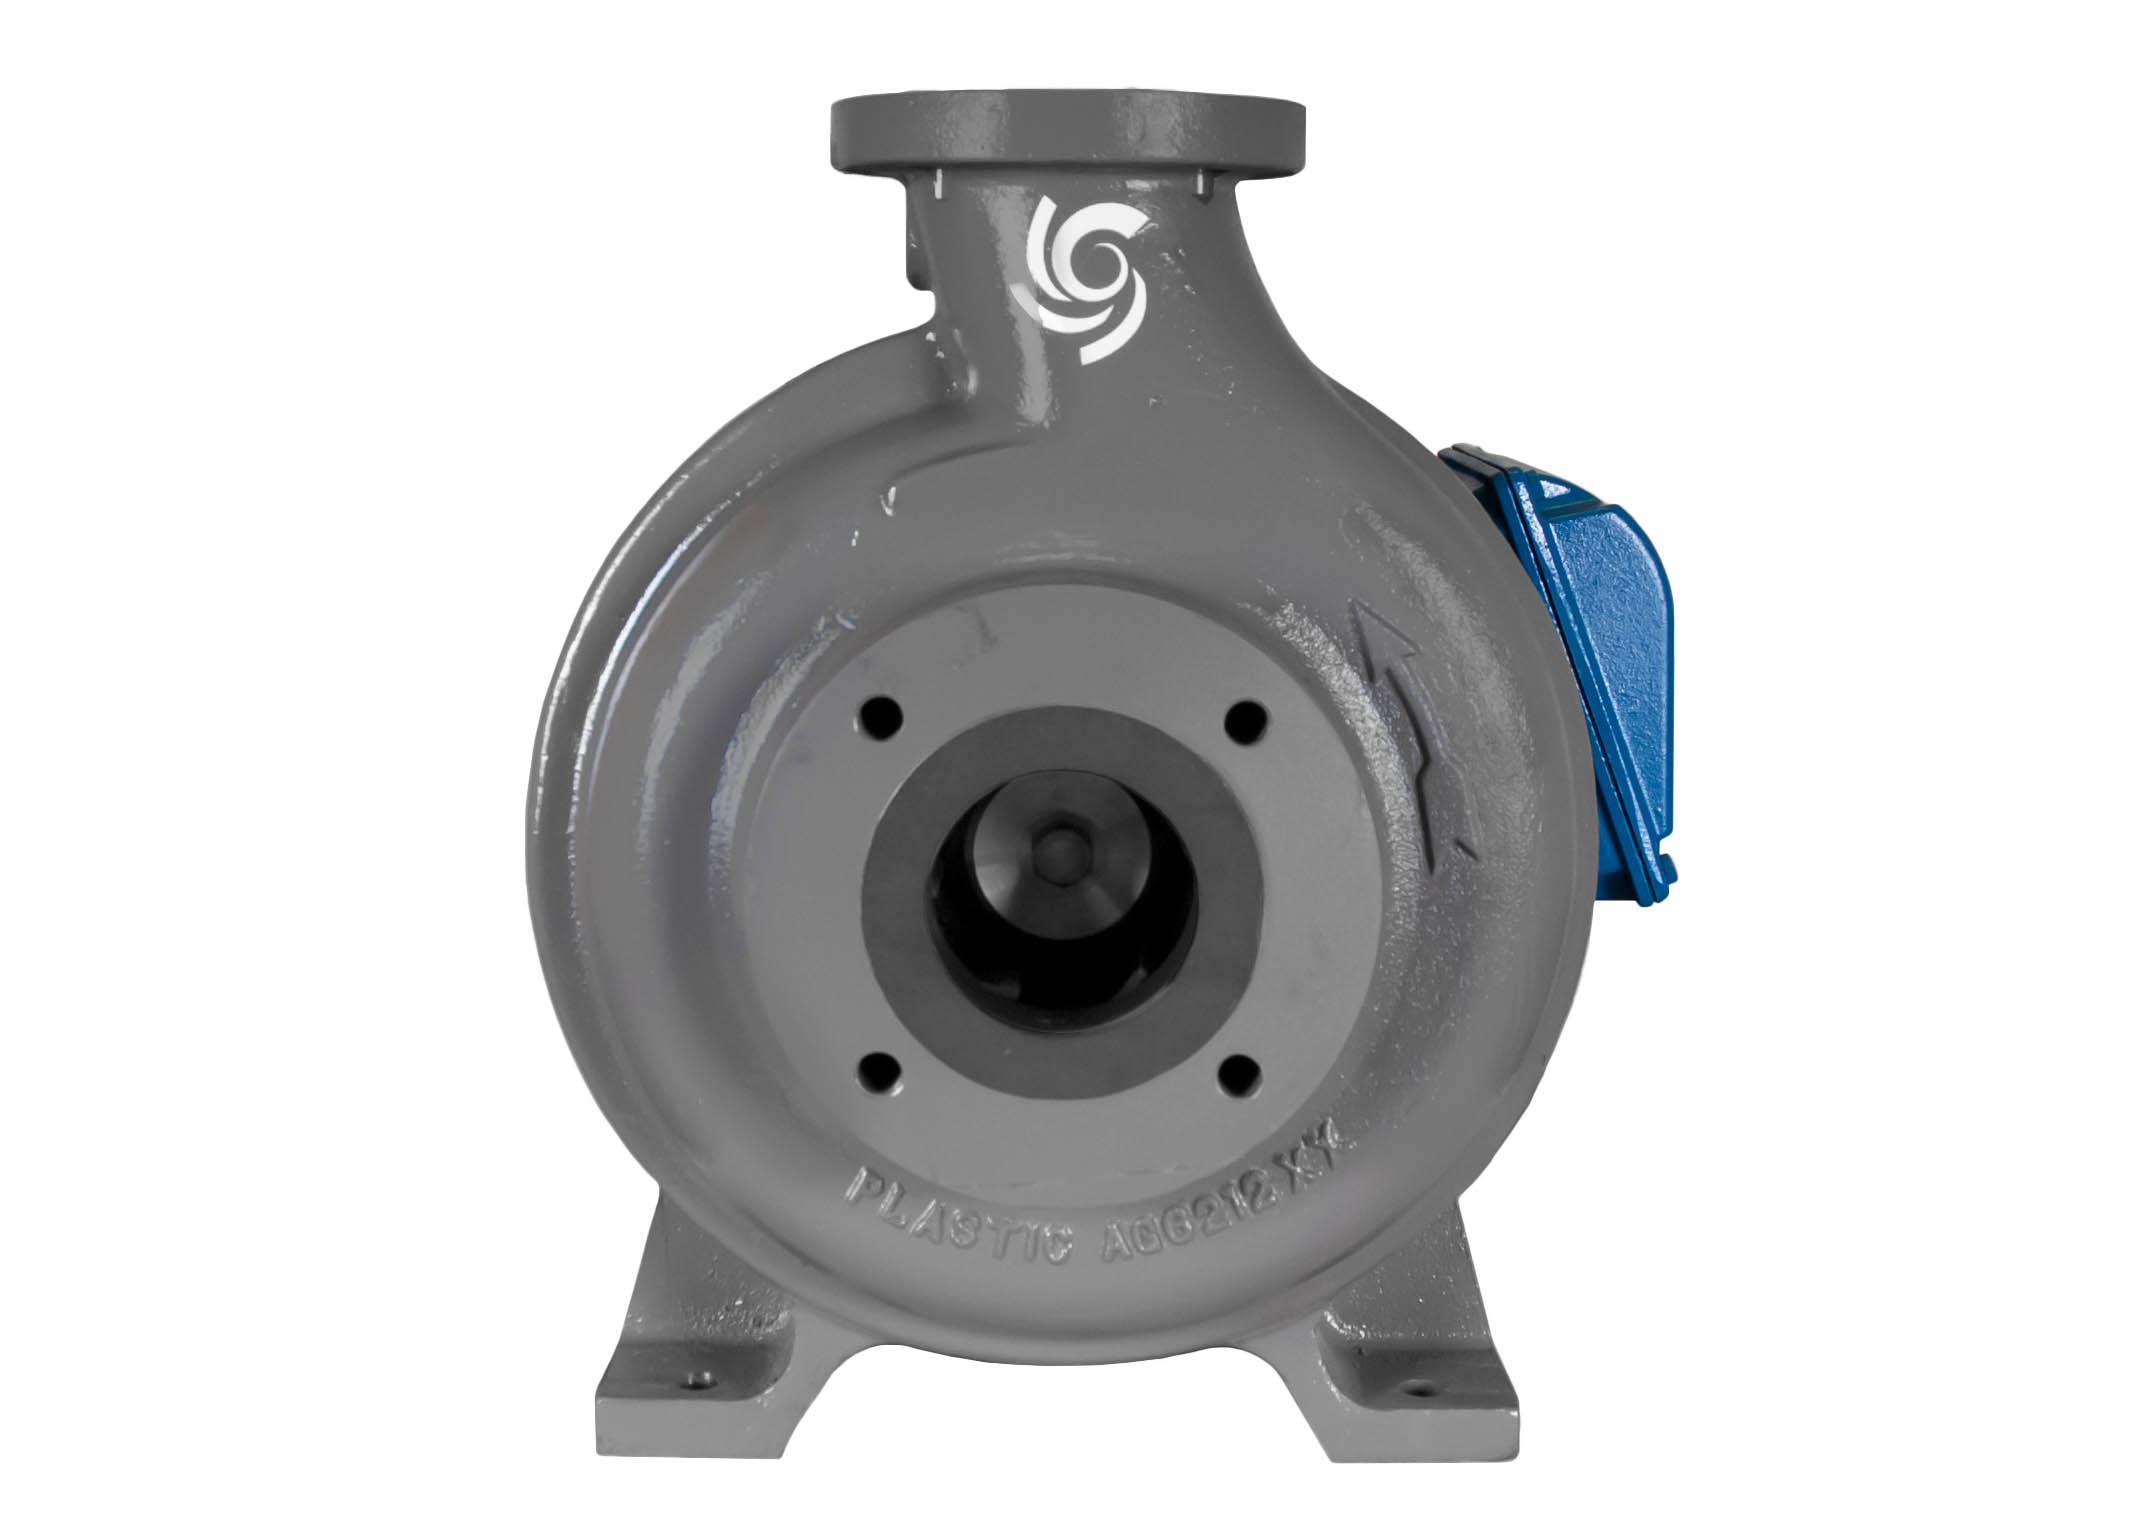 C-Shell 3x2-10 Pump with blue WEG Motor front view